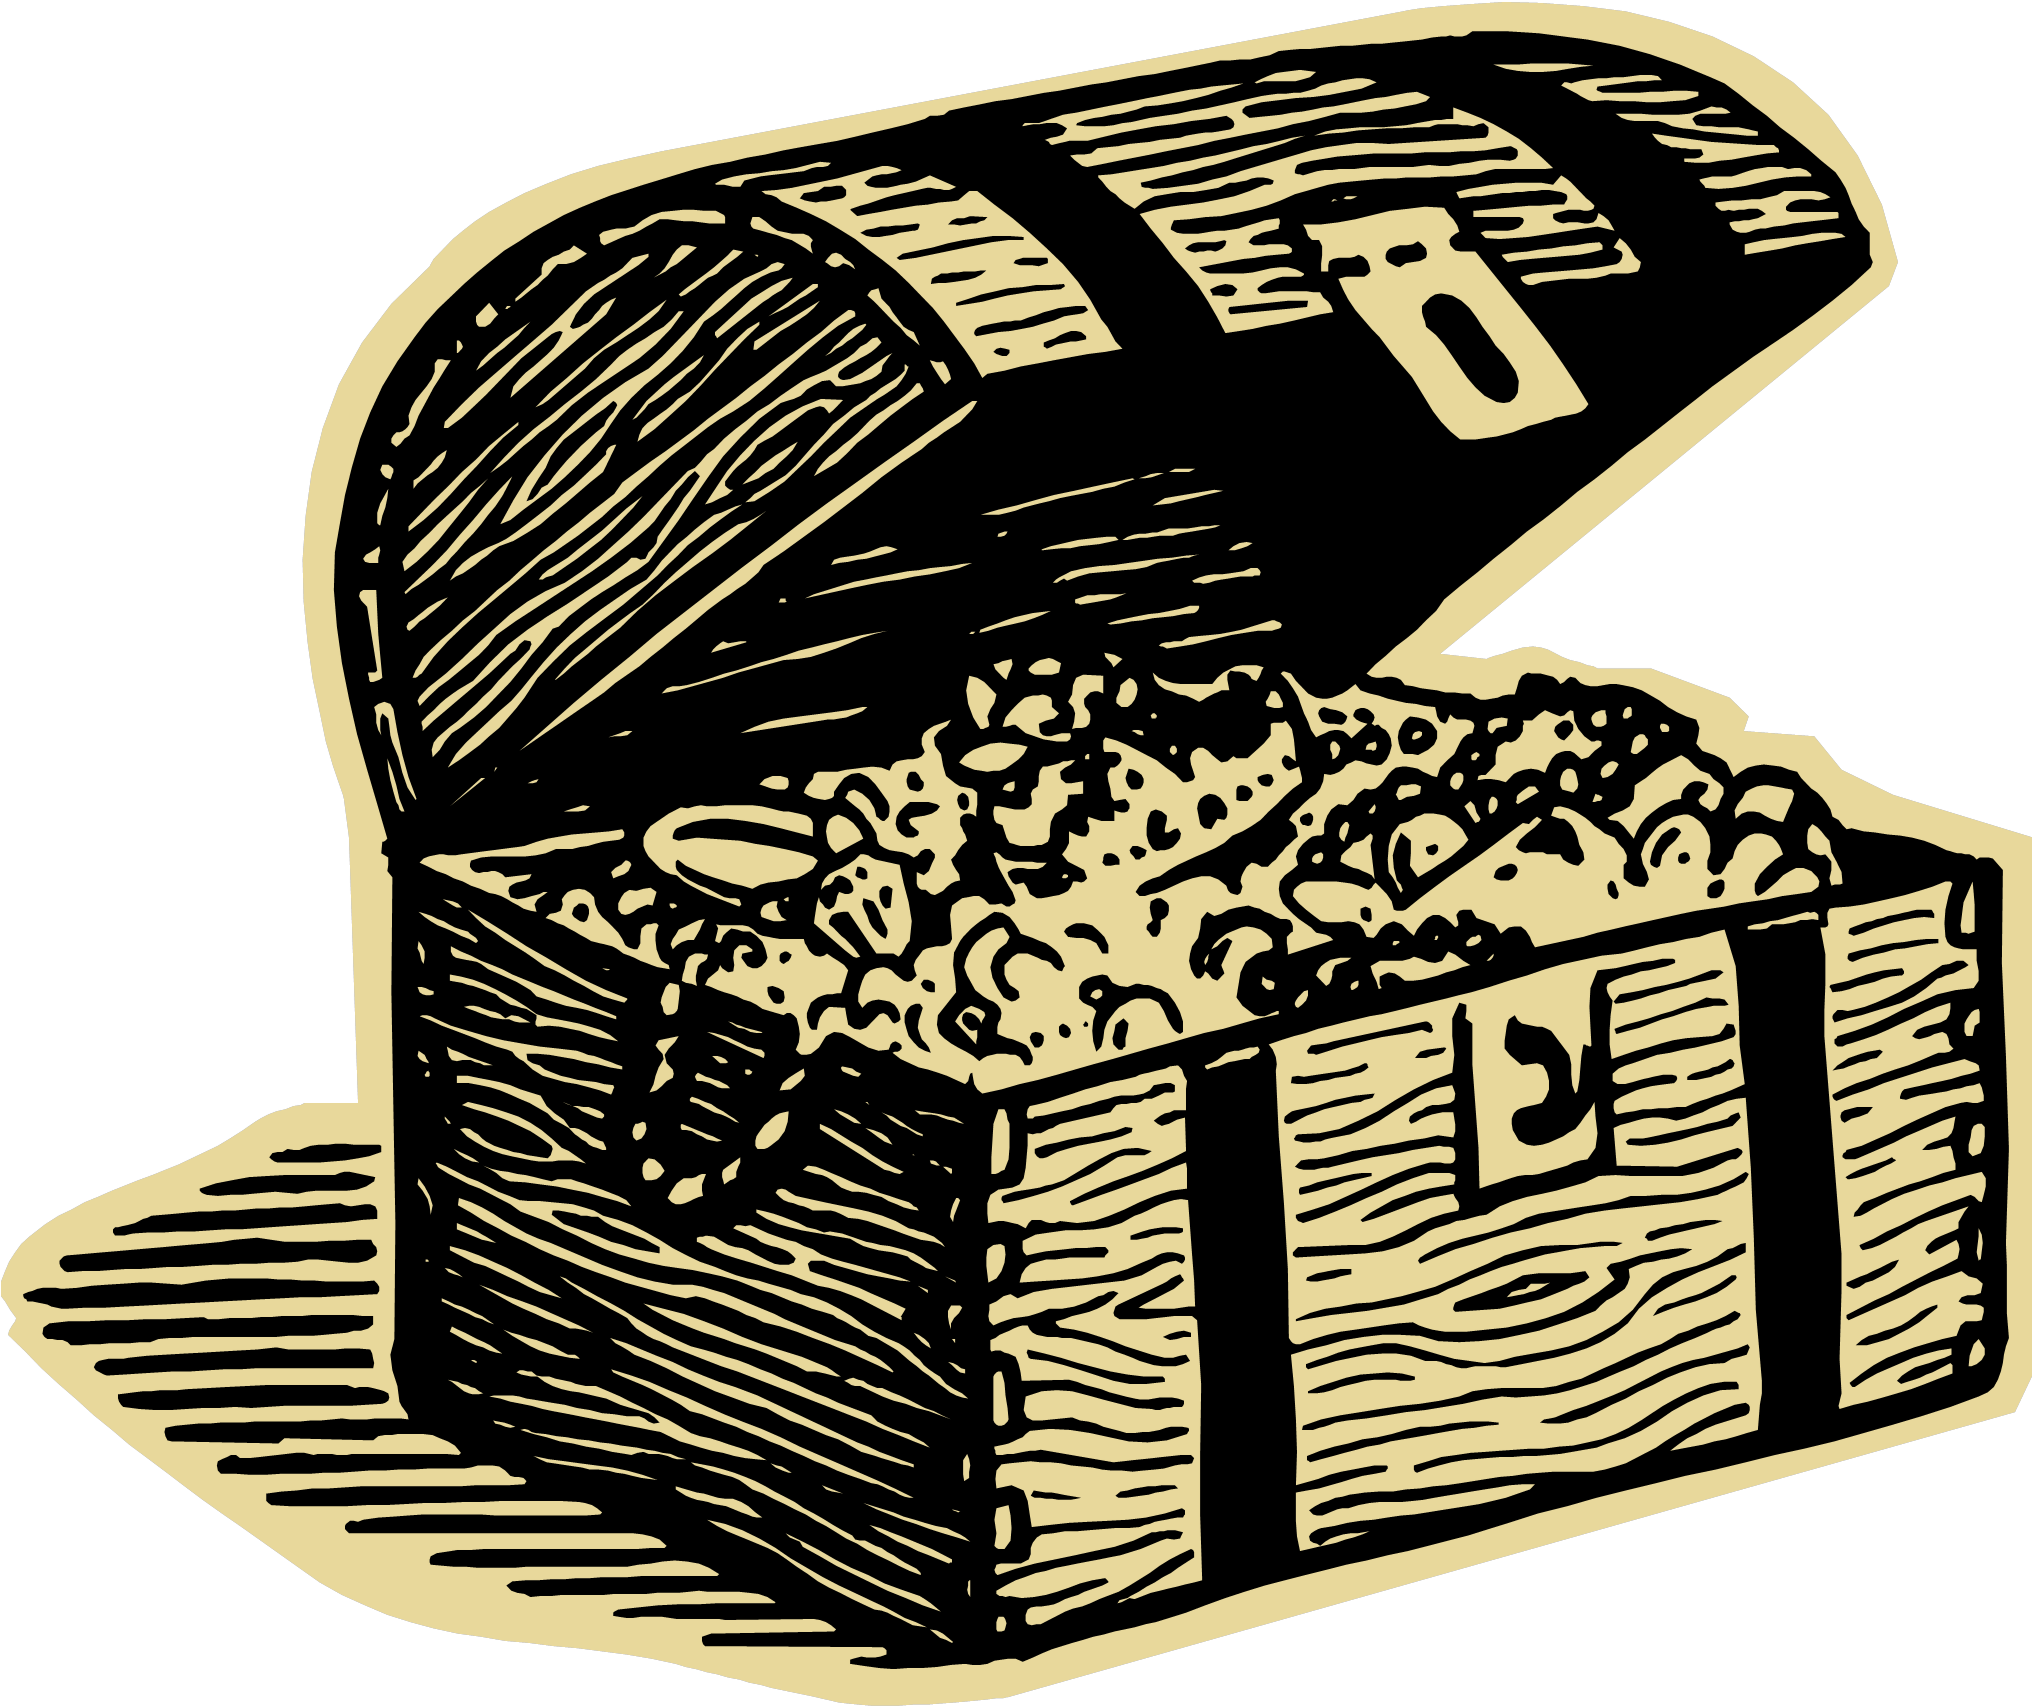 Transparent treasure chest clip art - Chest Clipart Pile Treasure - Treasure Hunt Animated Gif